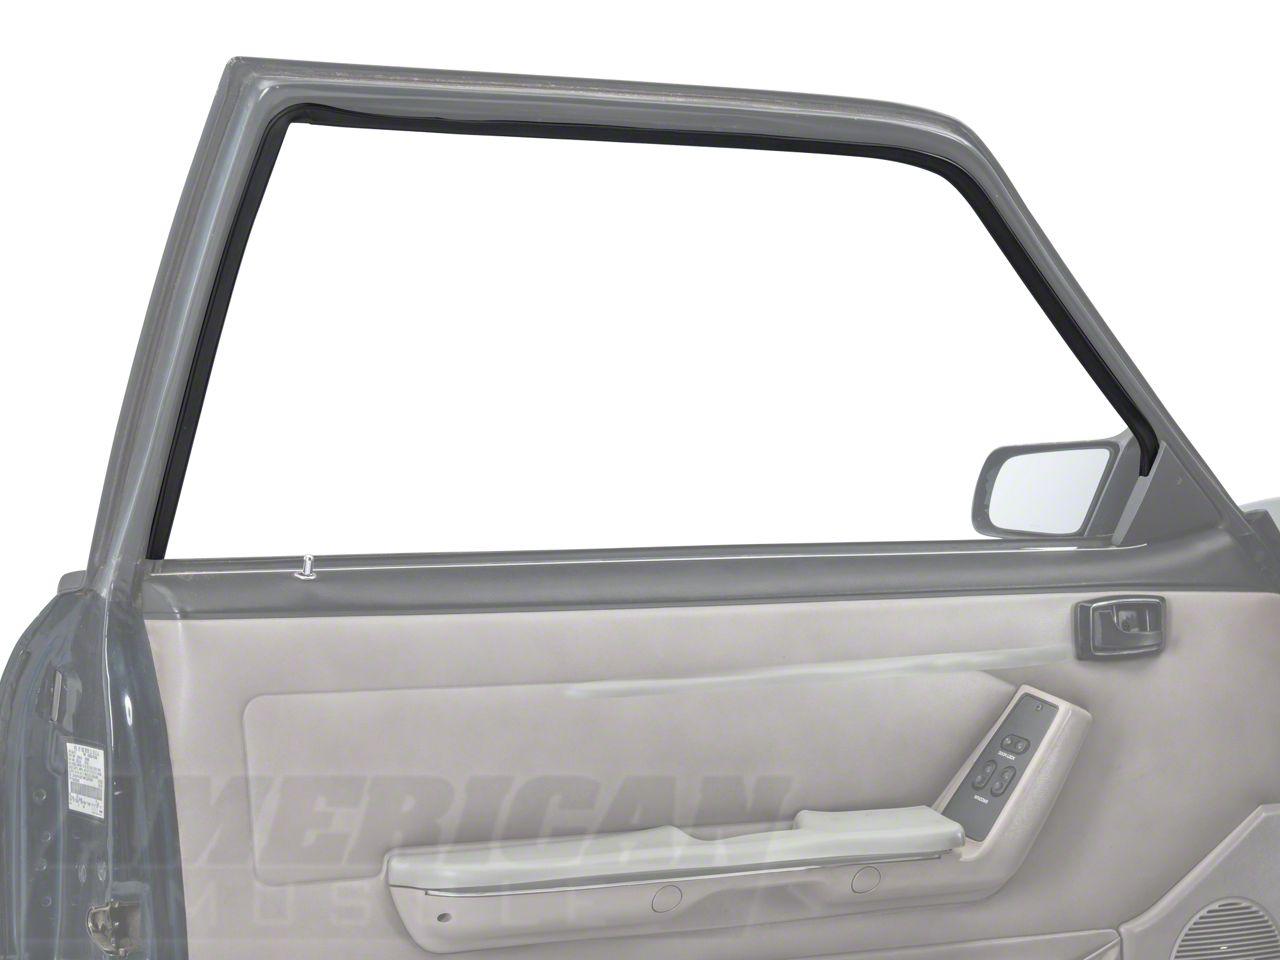 OPR Door Window Run Channel - Driver Side (79-93 Coupe, Hatchback)